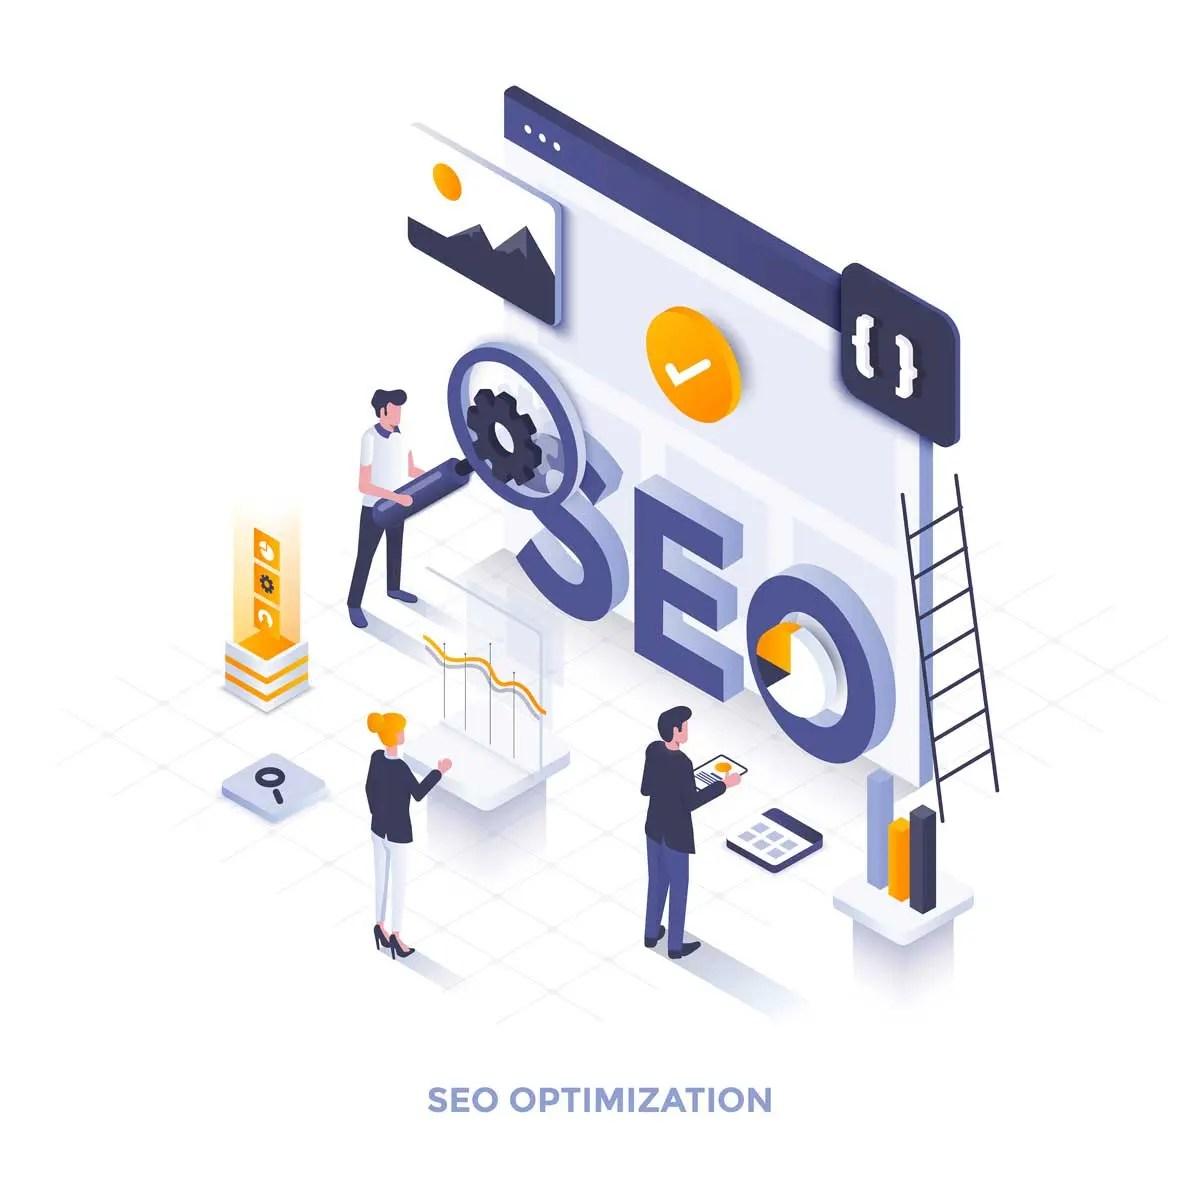 10 Writing Tips for SEO Optimization